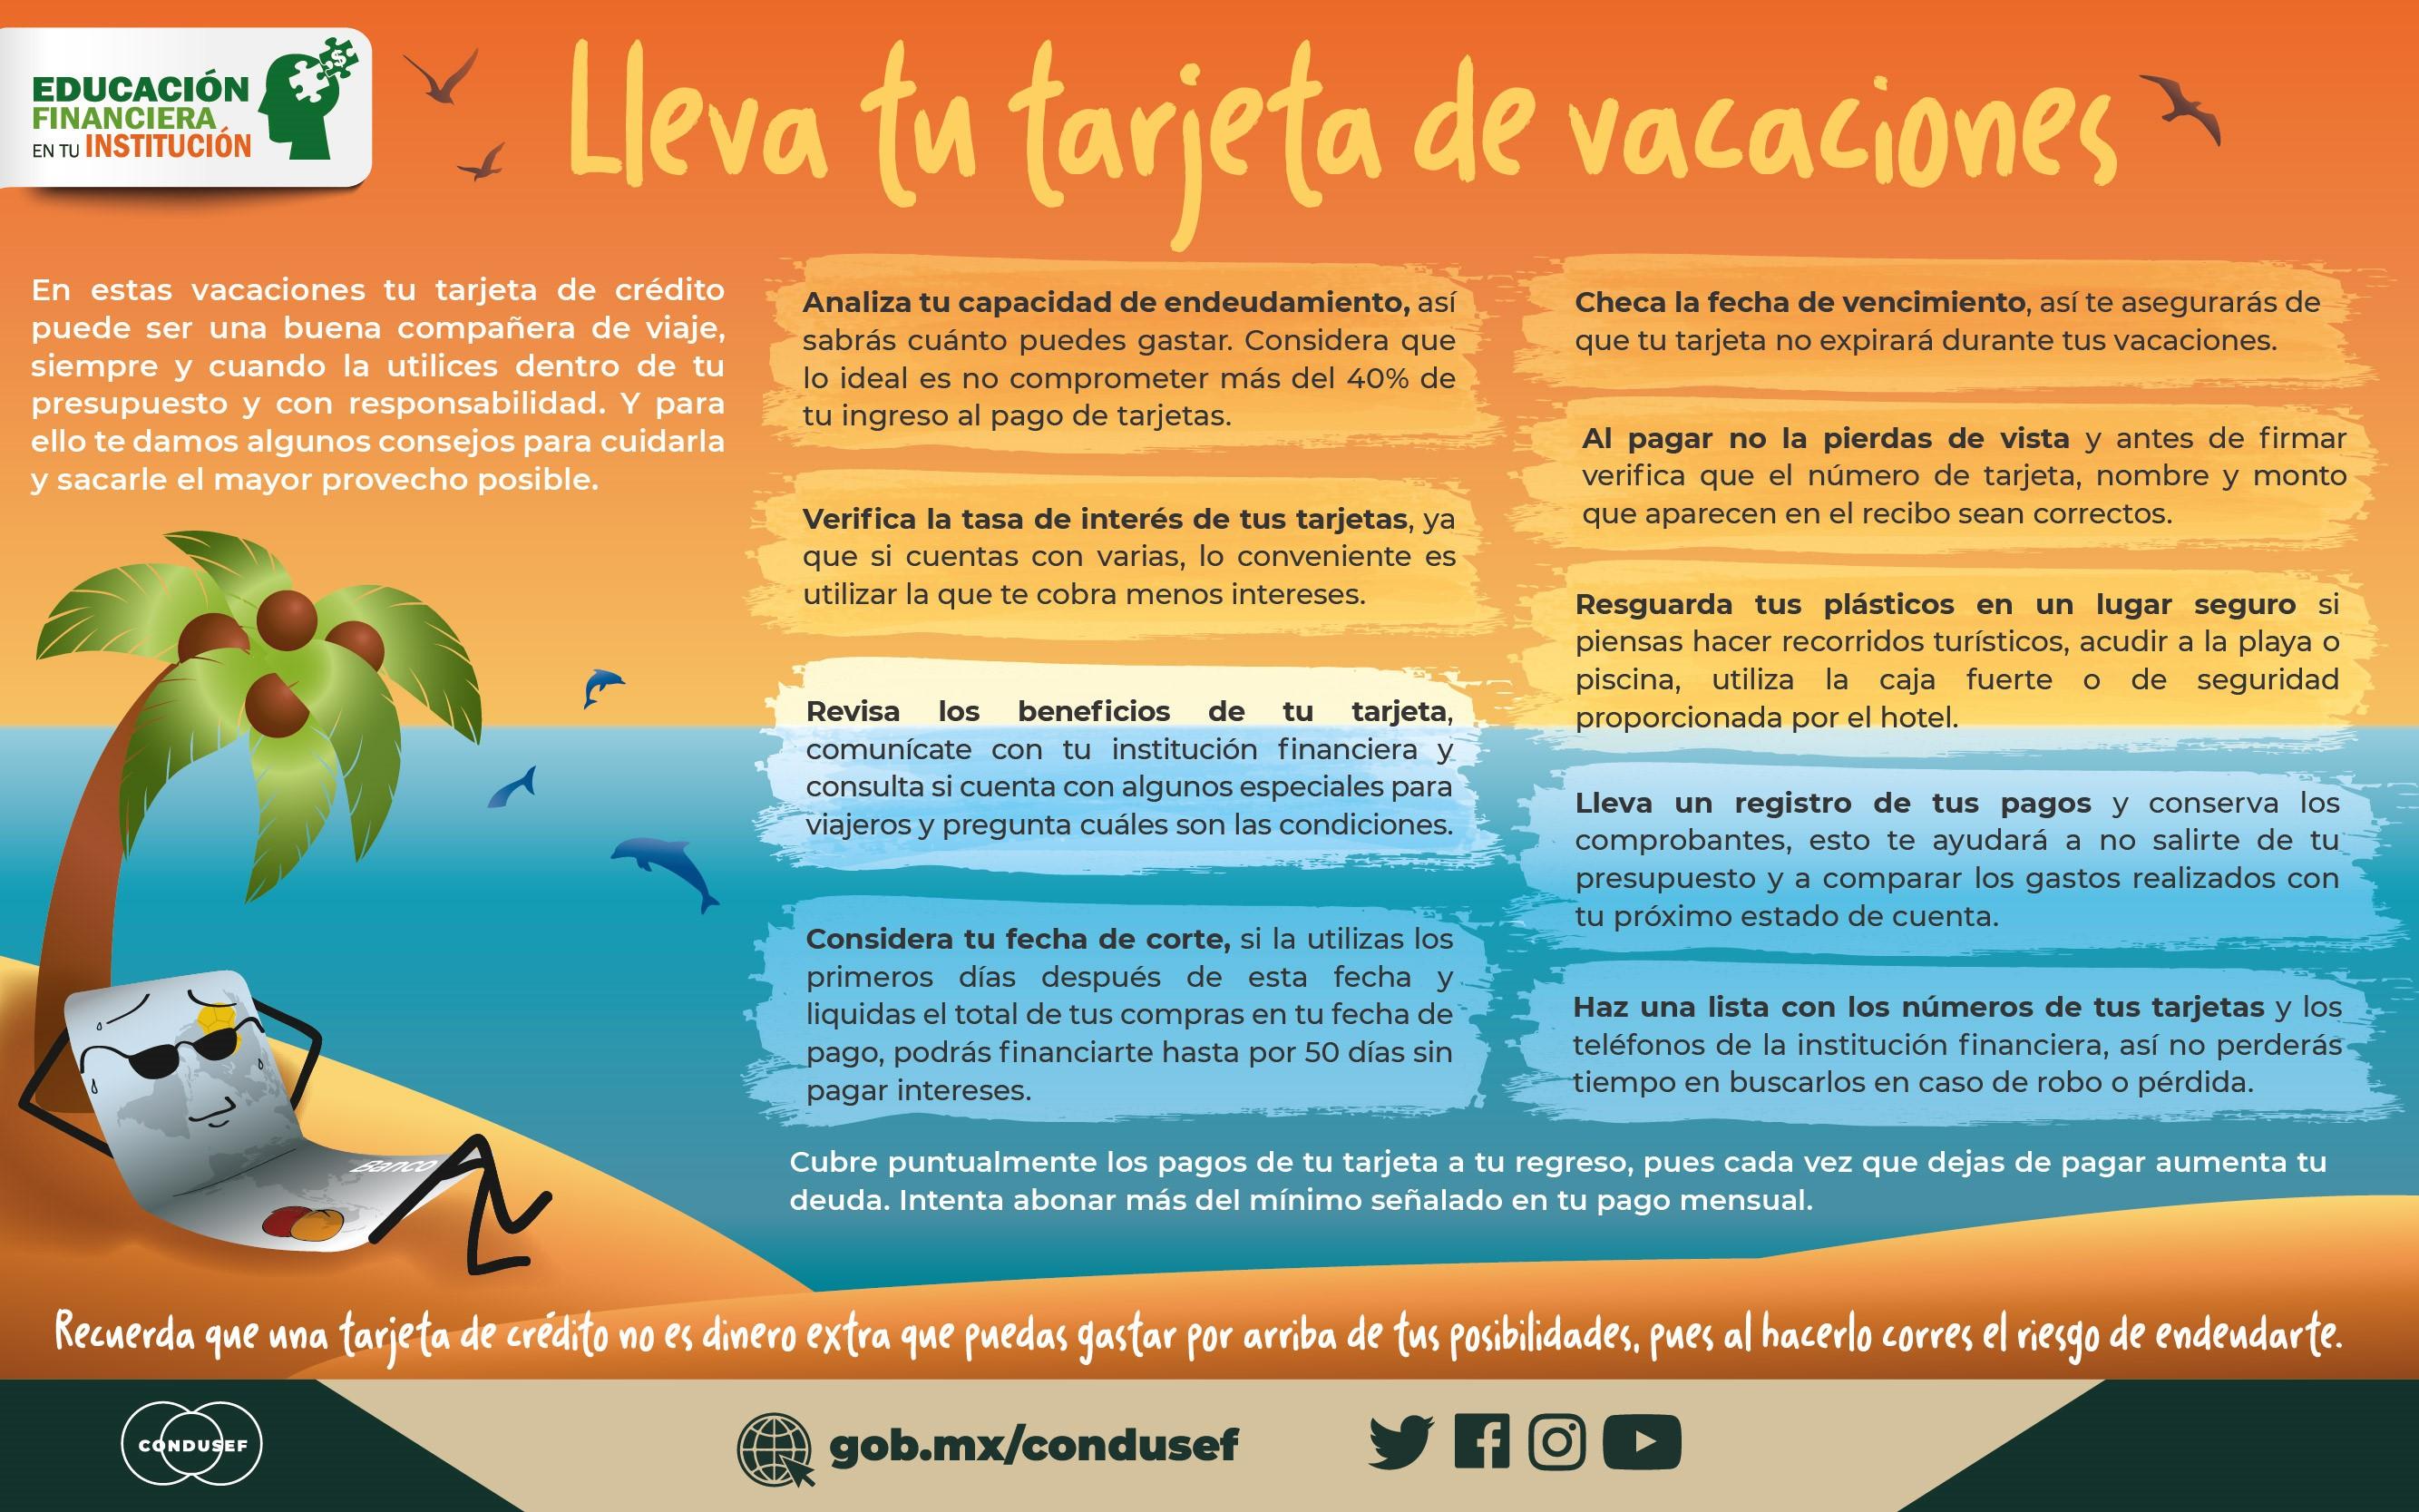 Lleva tu tarjeta de vacaciones